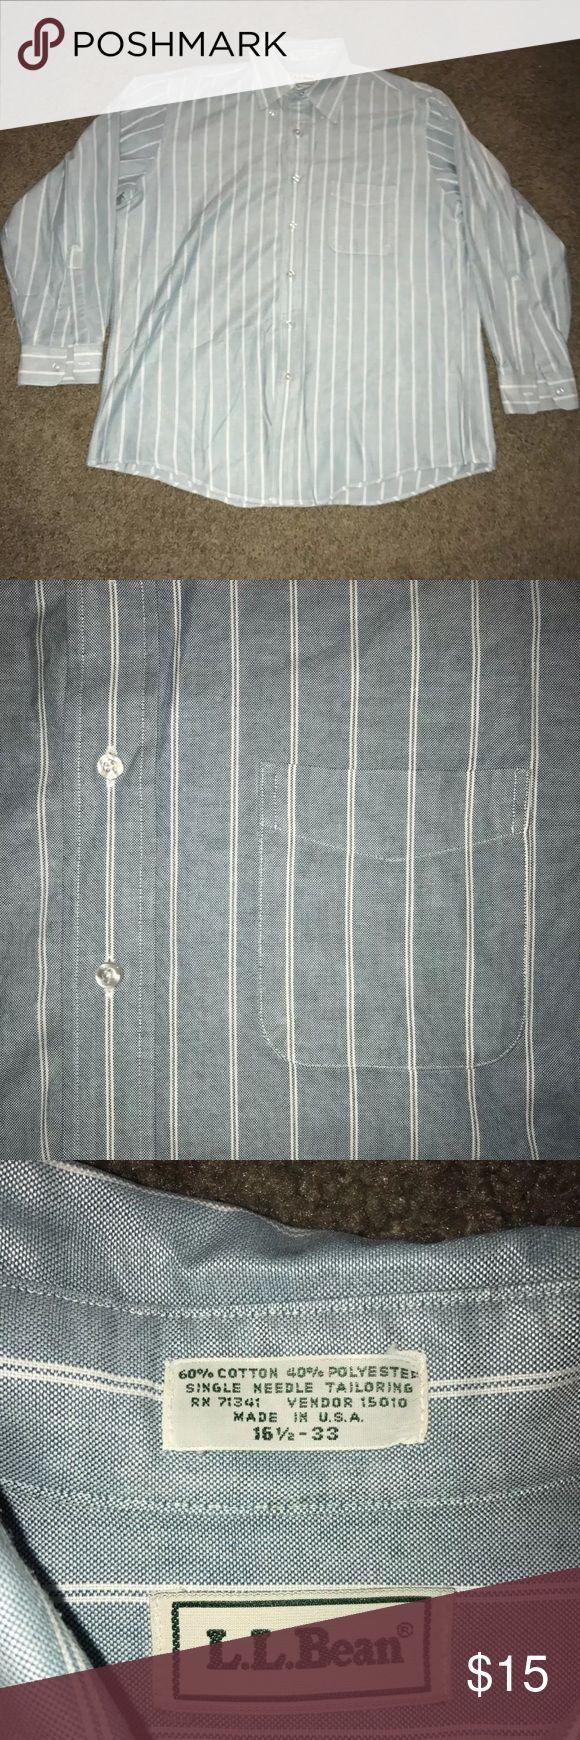 LL bean men's dress shirt 16.5-33 In great condition L.L. Bean Shirts Dress Shirts